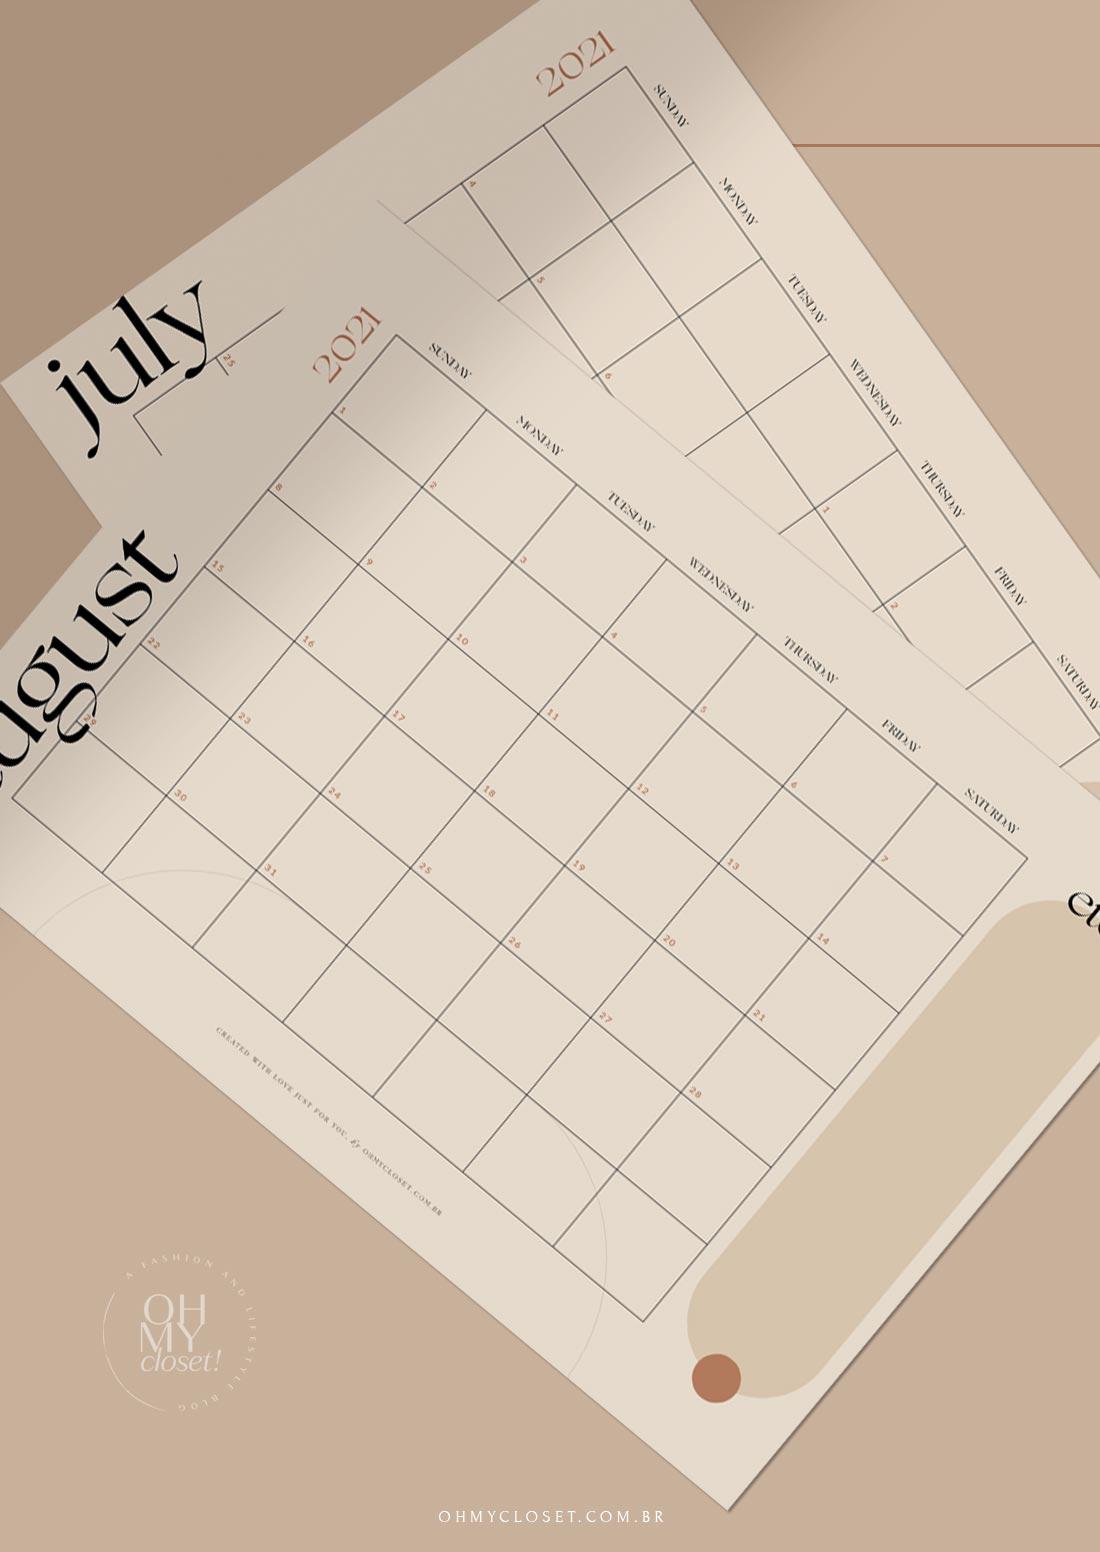 Detalhe do planner modern minimalist em inglês.